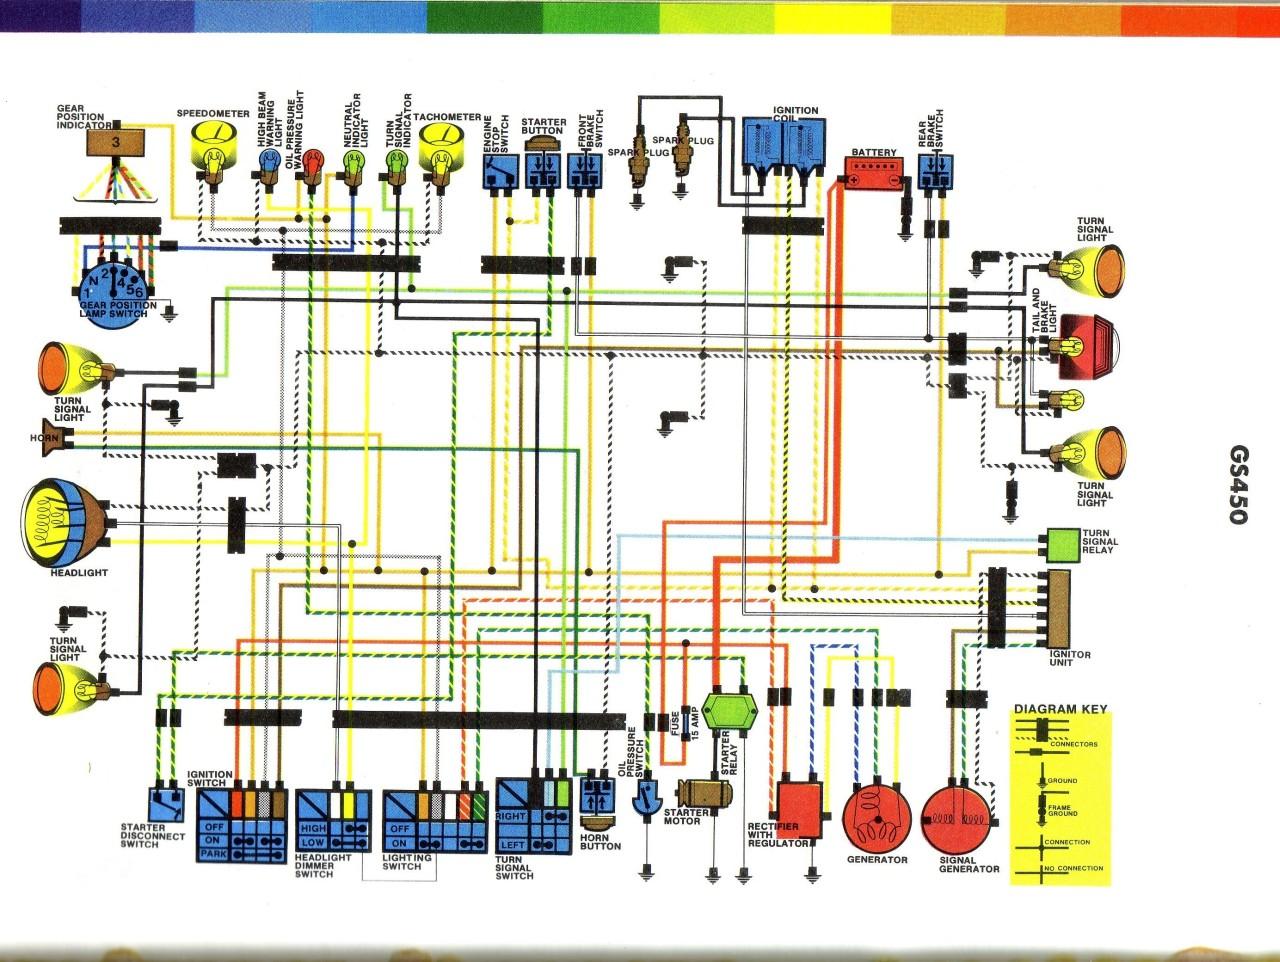 gs450 wiring diagram gs450lie gs550 wiring diagram gs450 wiring diagram [ 1280 x 962 Pixel ]